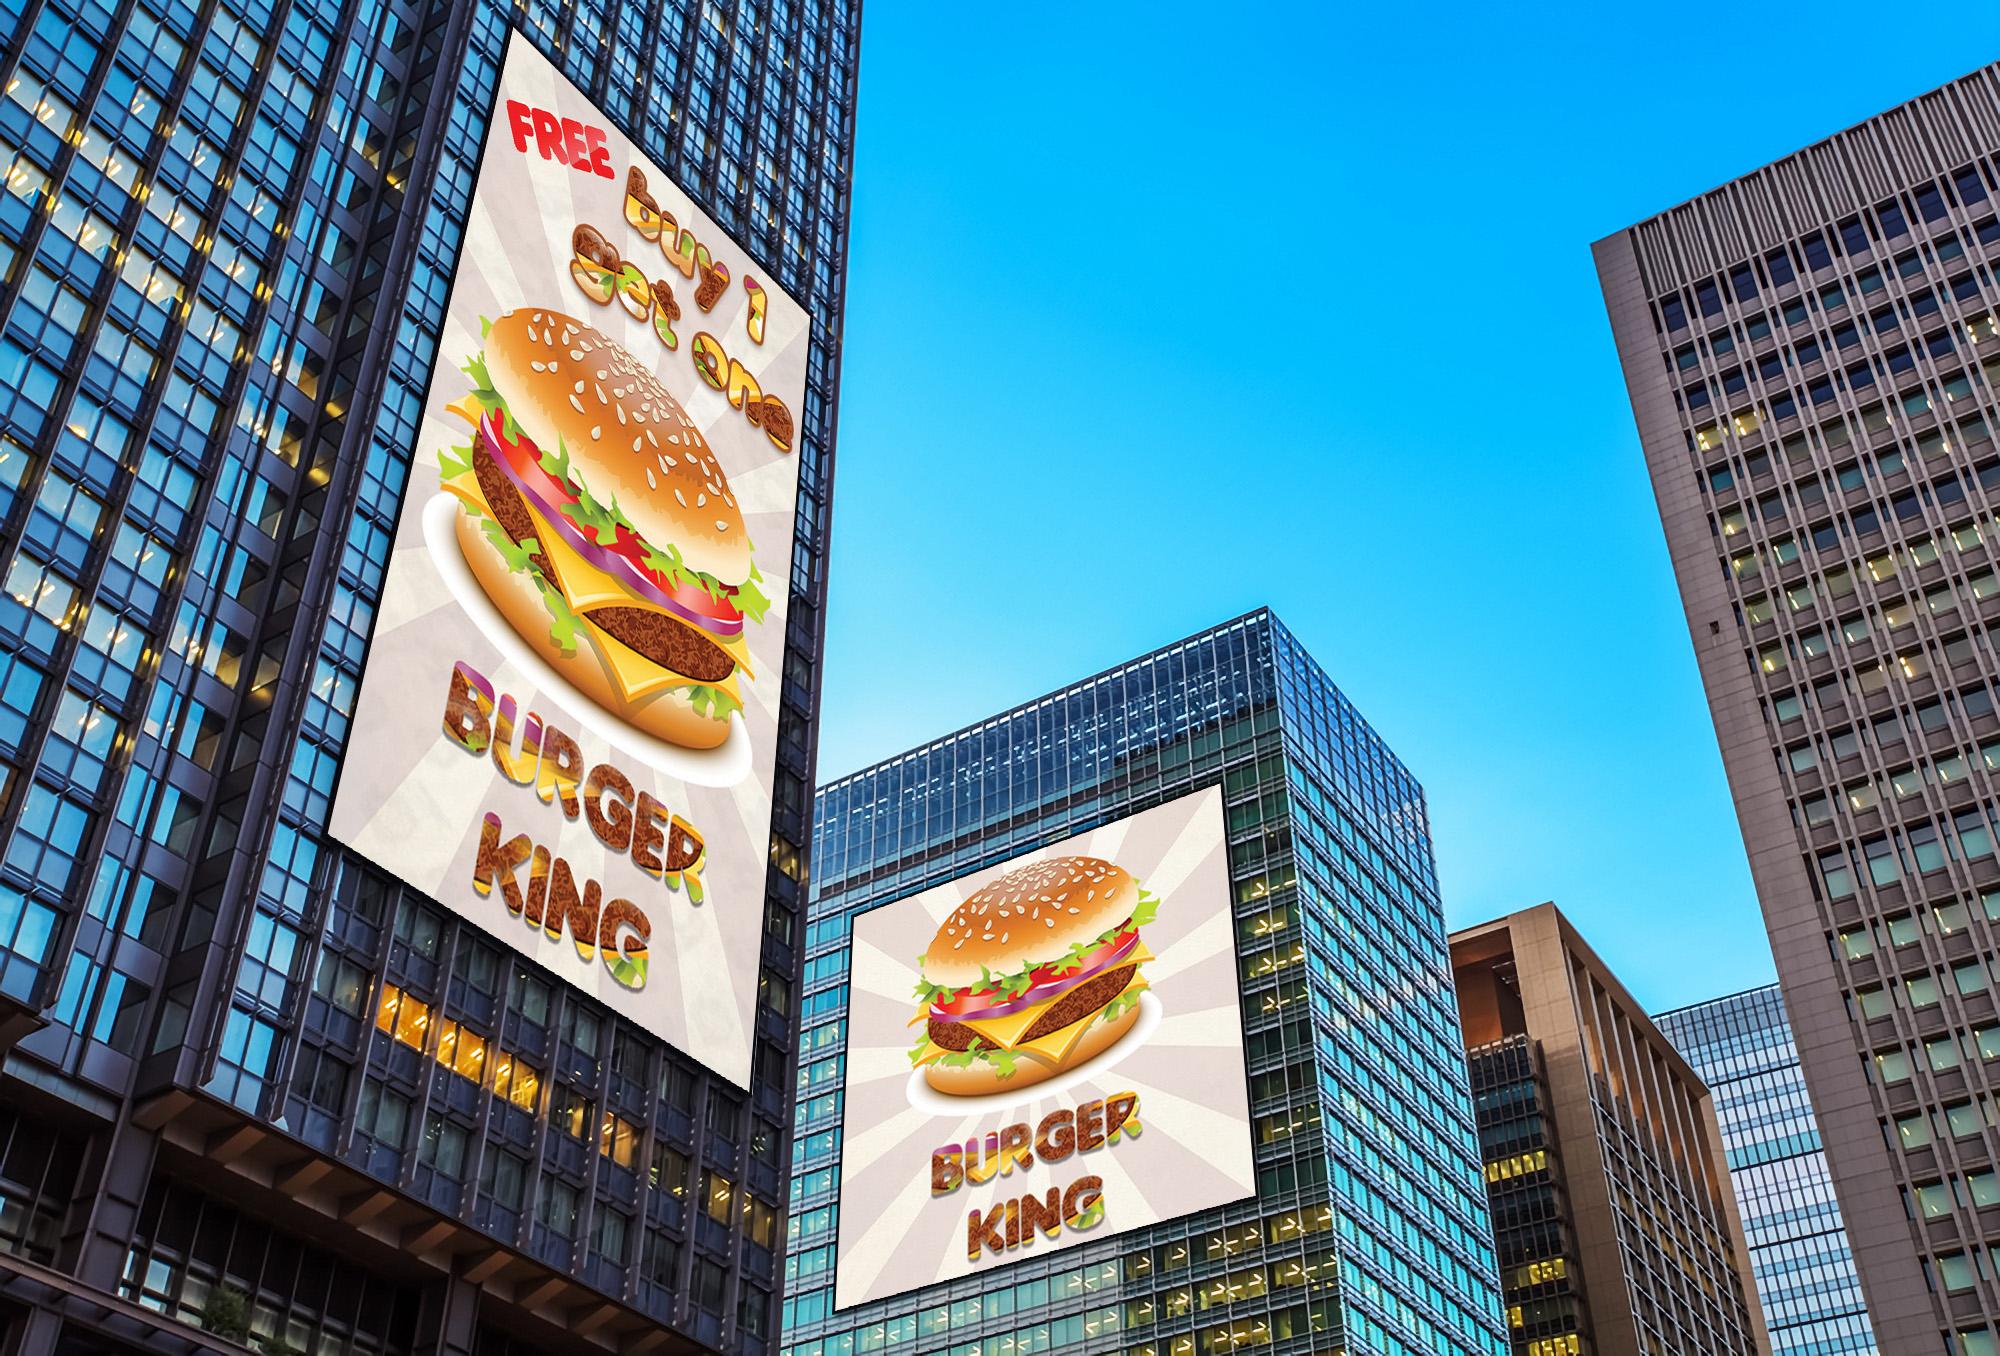 Design A Billboard,  Banner Or Outdoor